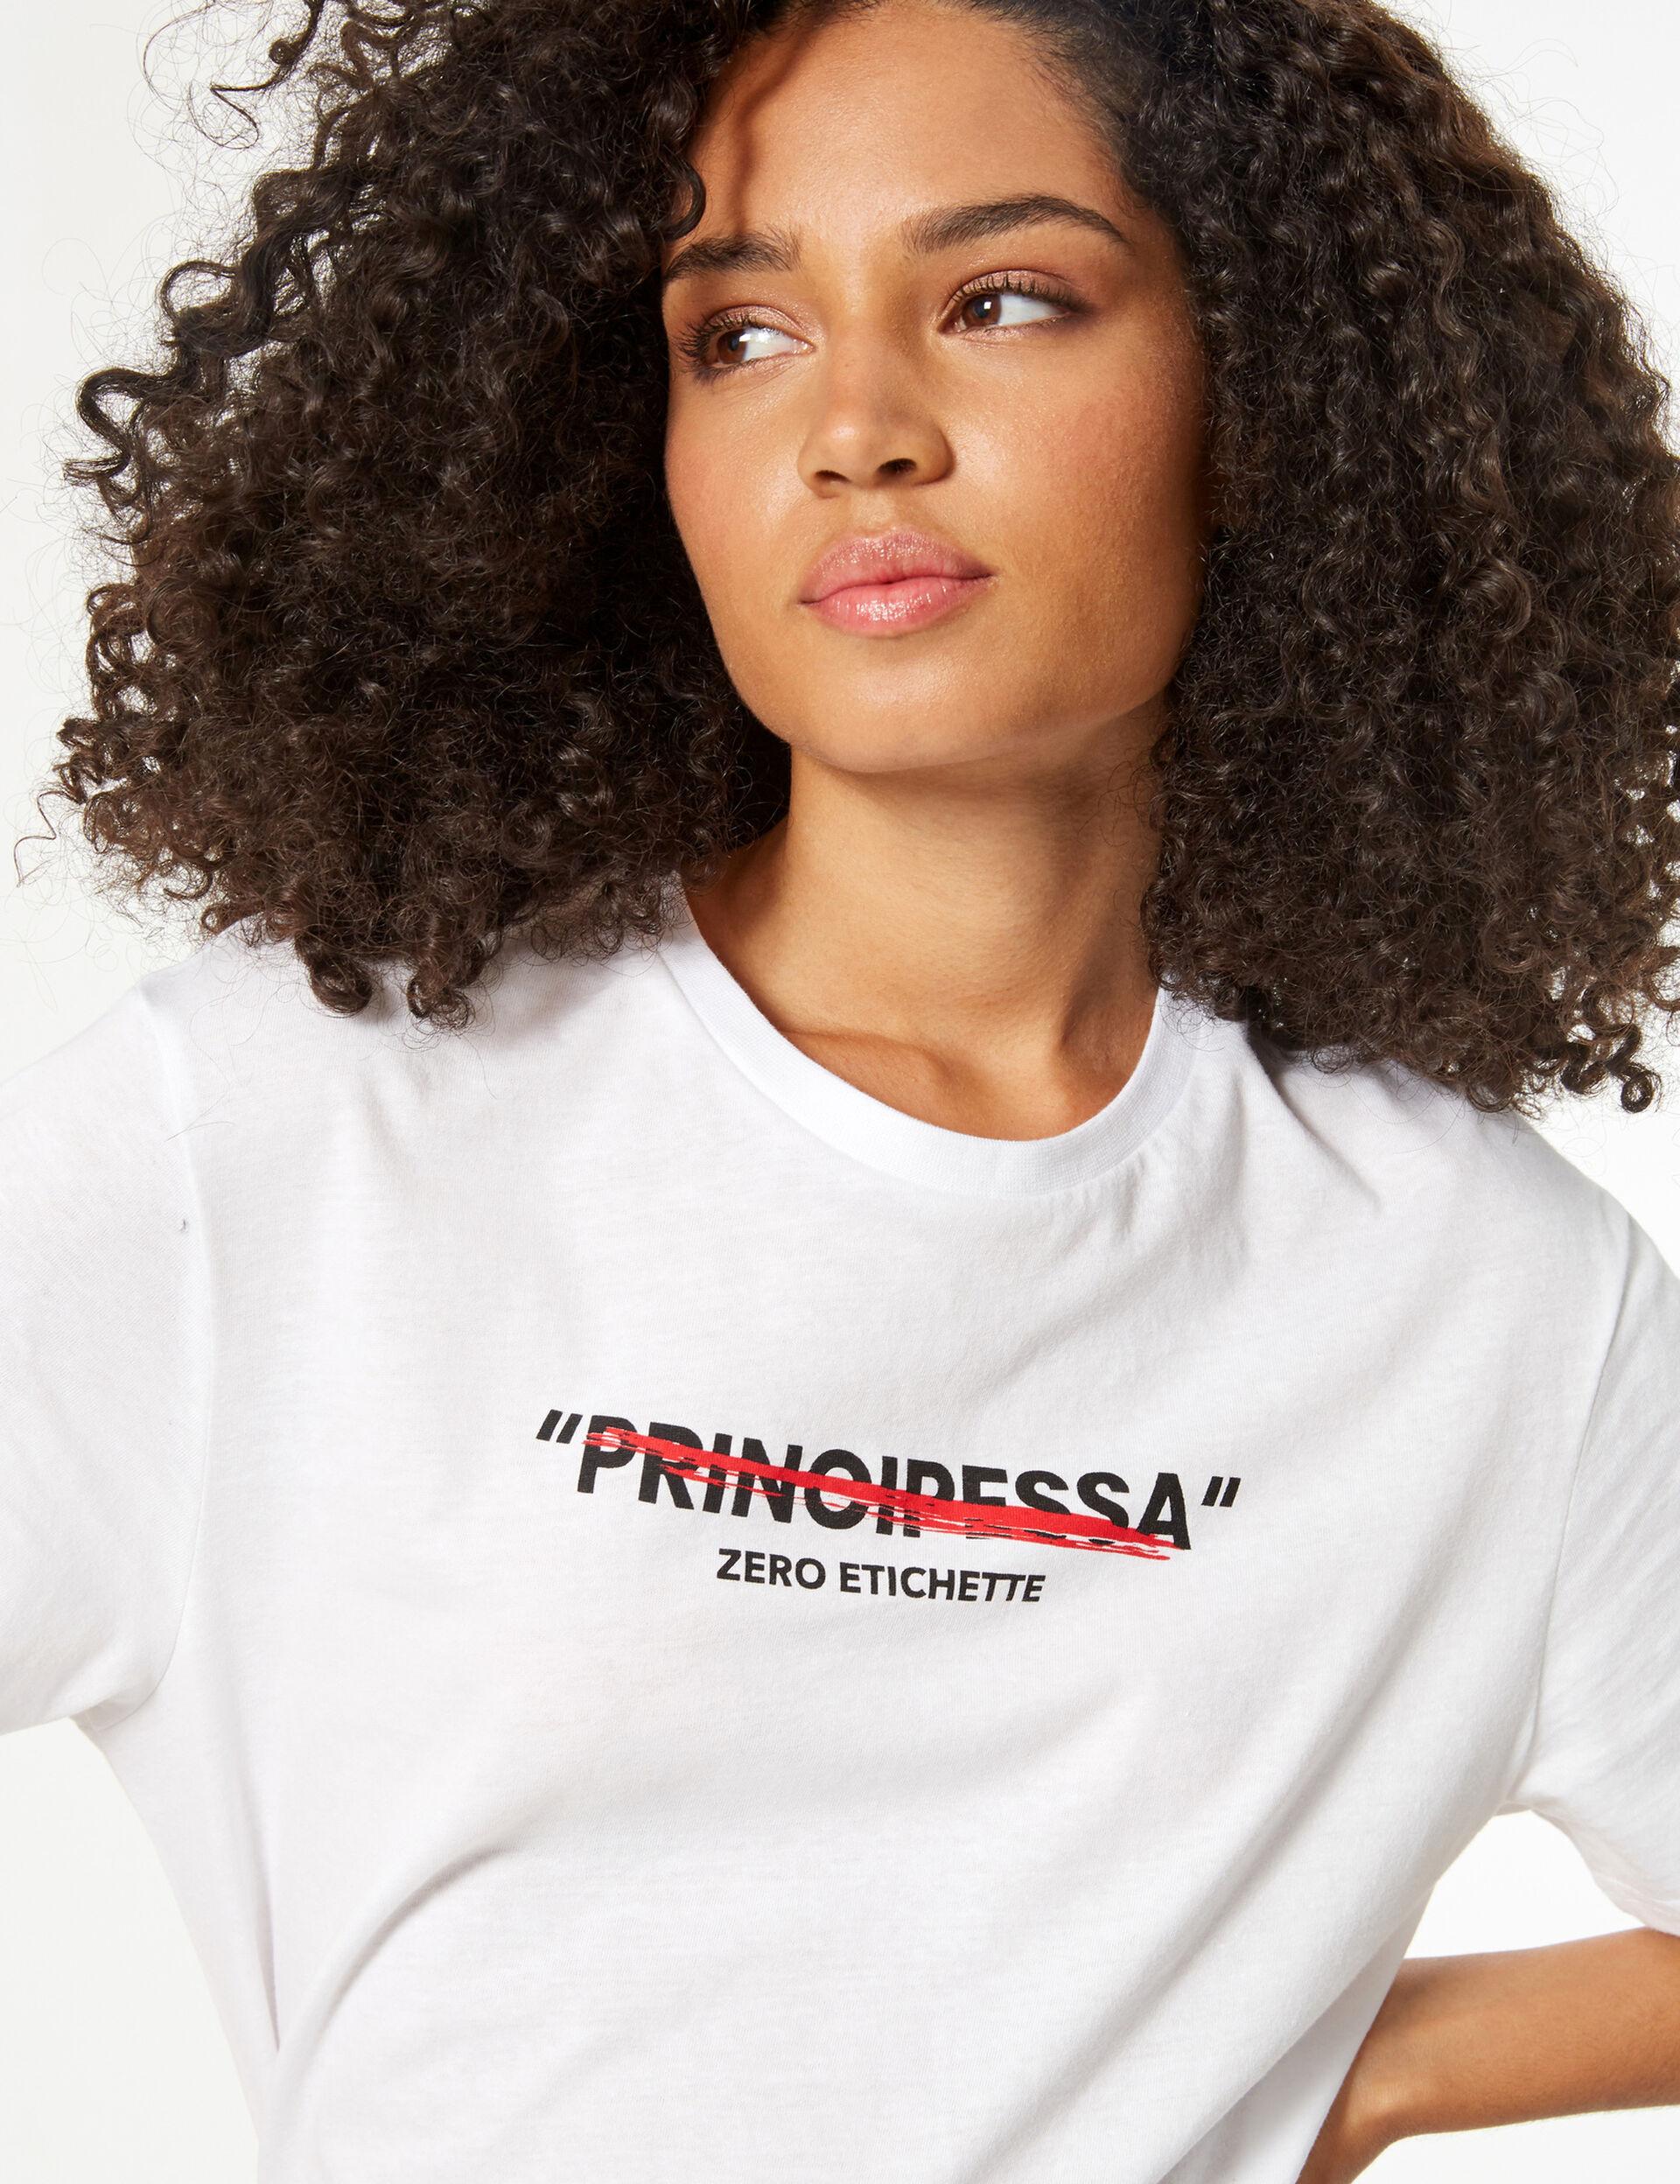 'Don't call me principessa' ('don't call me princess') T-shirt